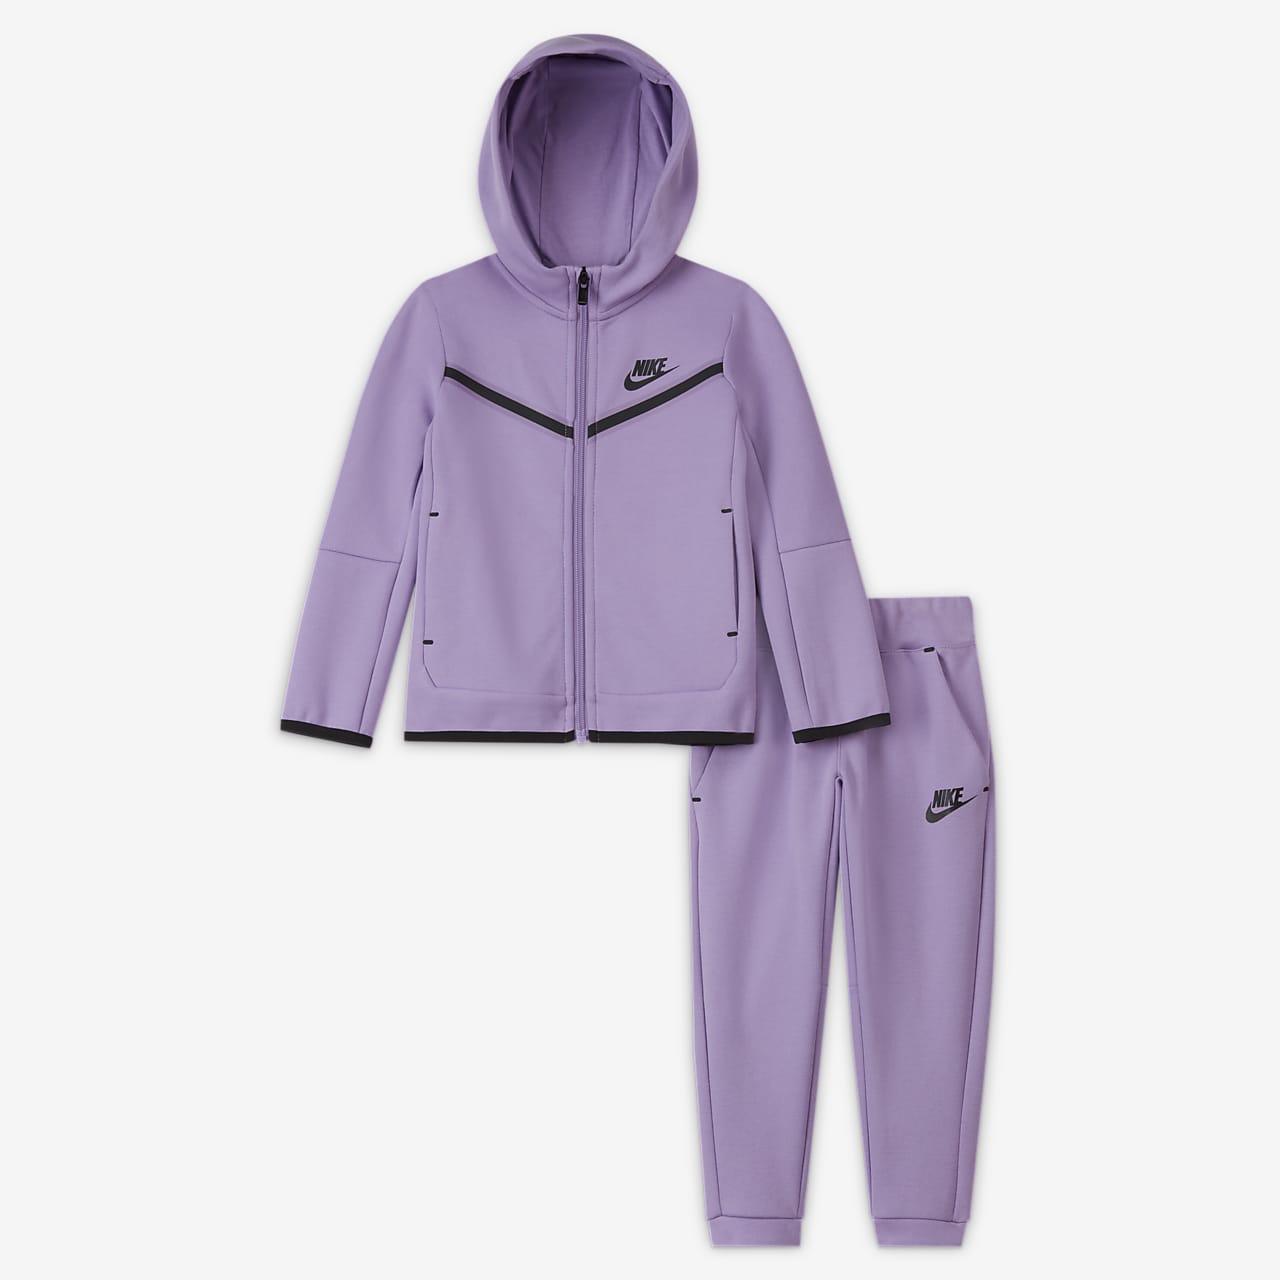 Nike Sportswear Tech Fleece Toddler Zip Hoodie And Pants Set Nike Com